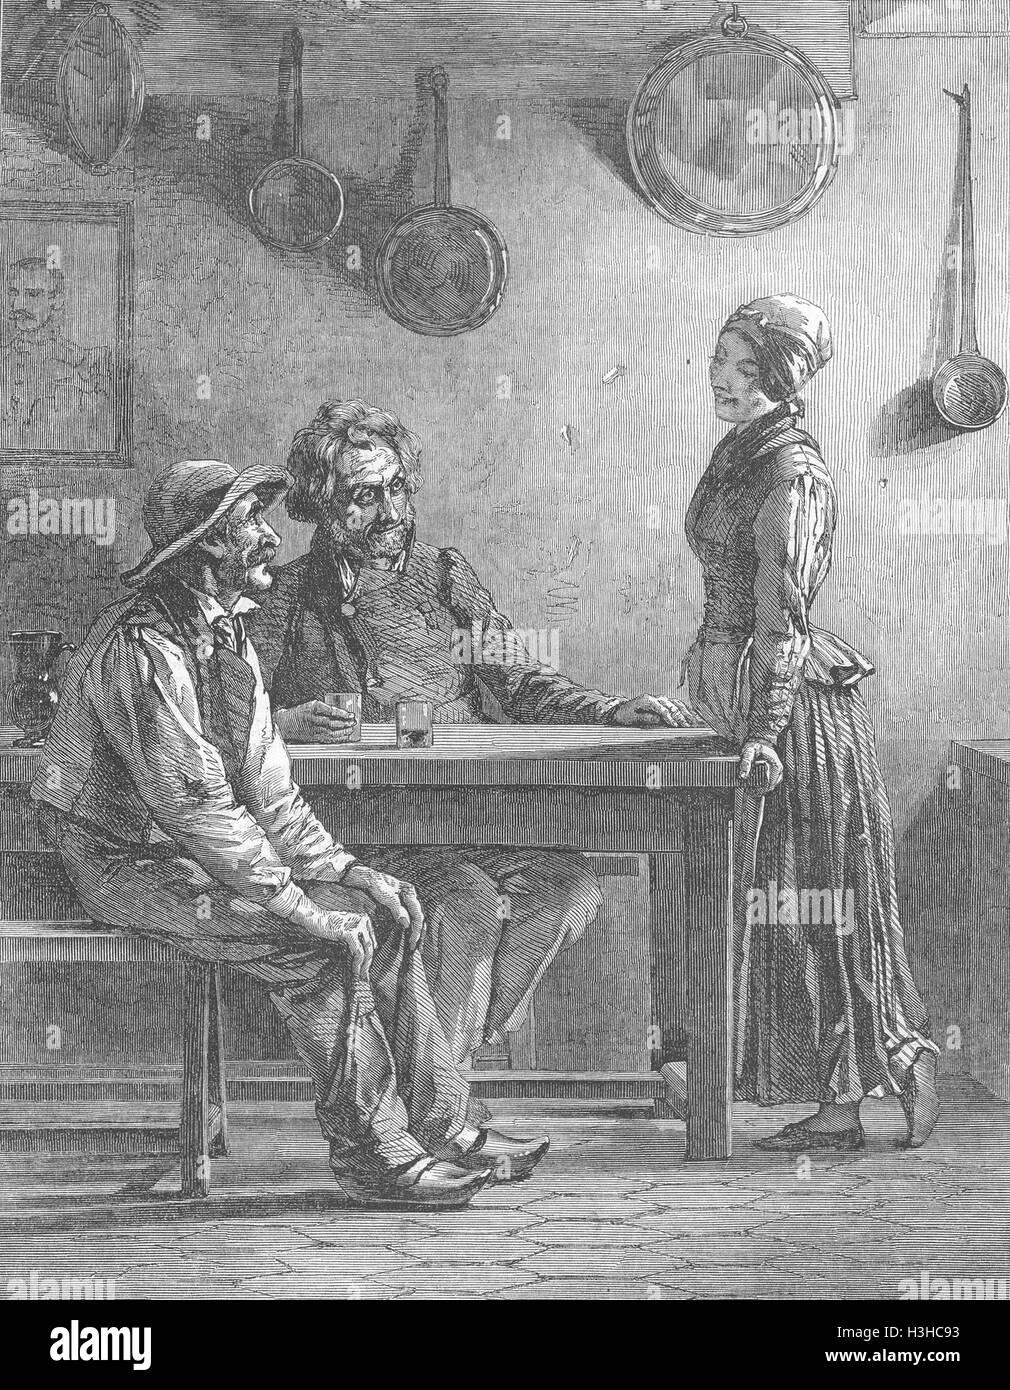 POLITICS Socialists 1850. Illustrated London News - Stock Image